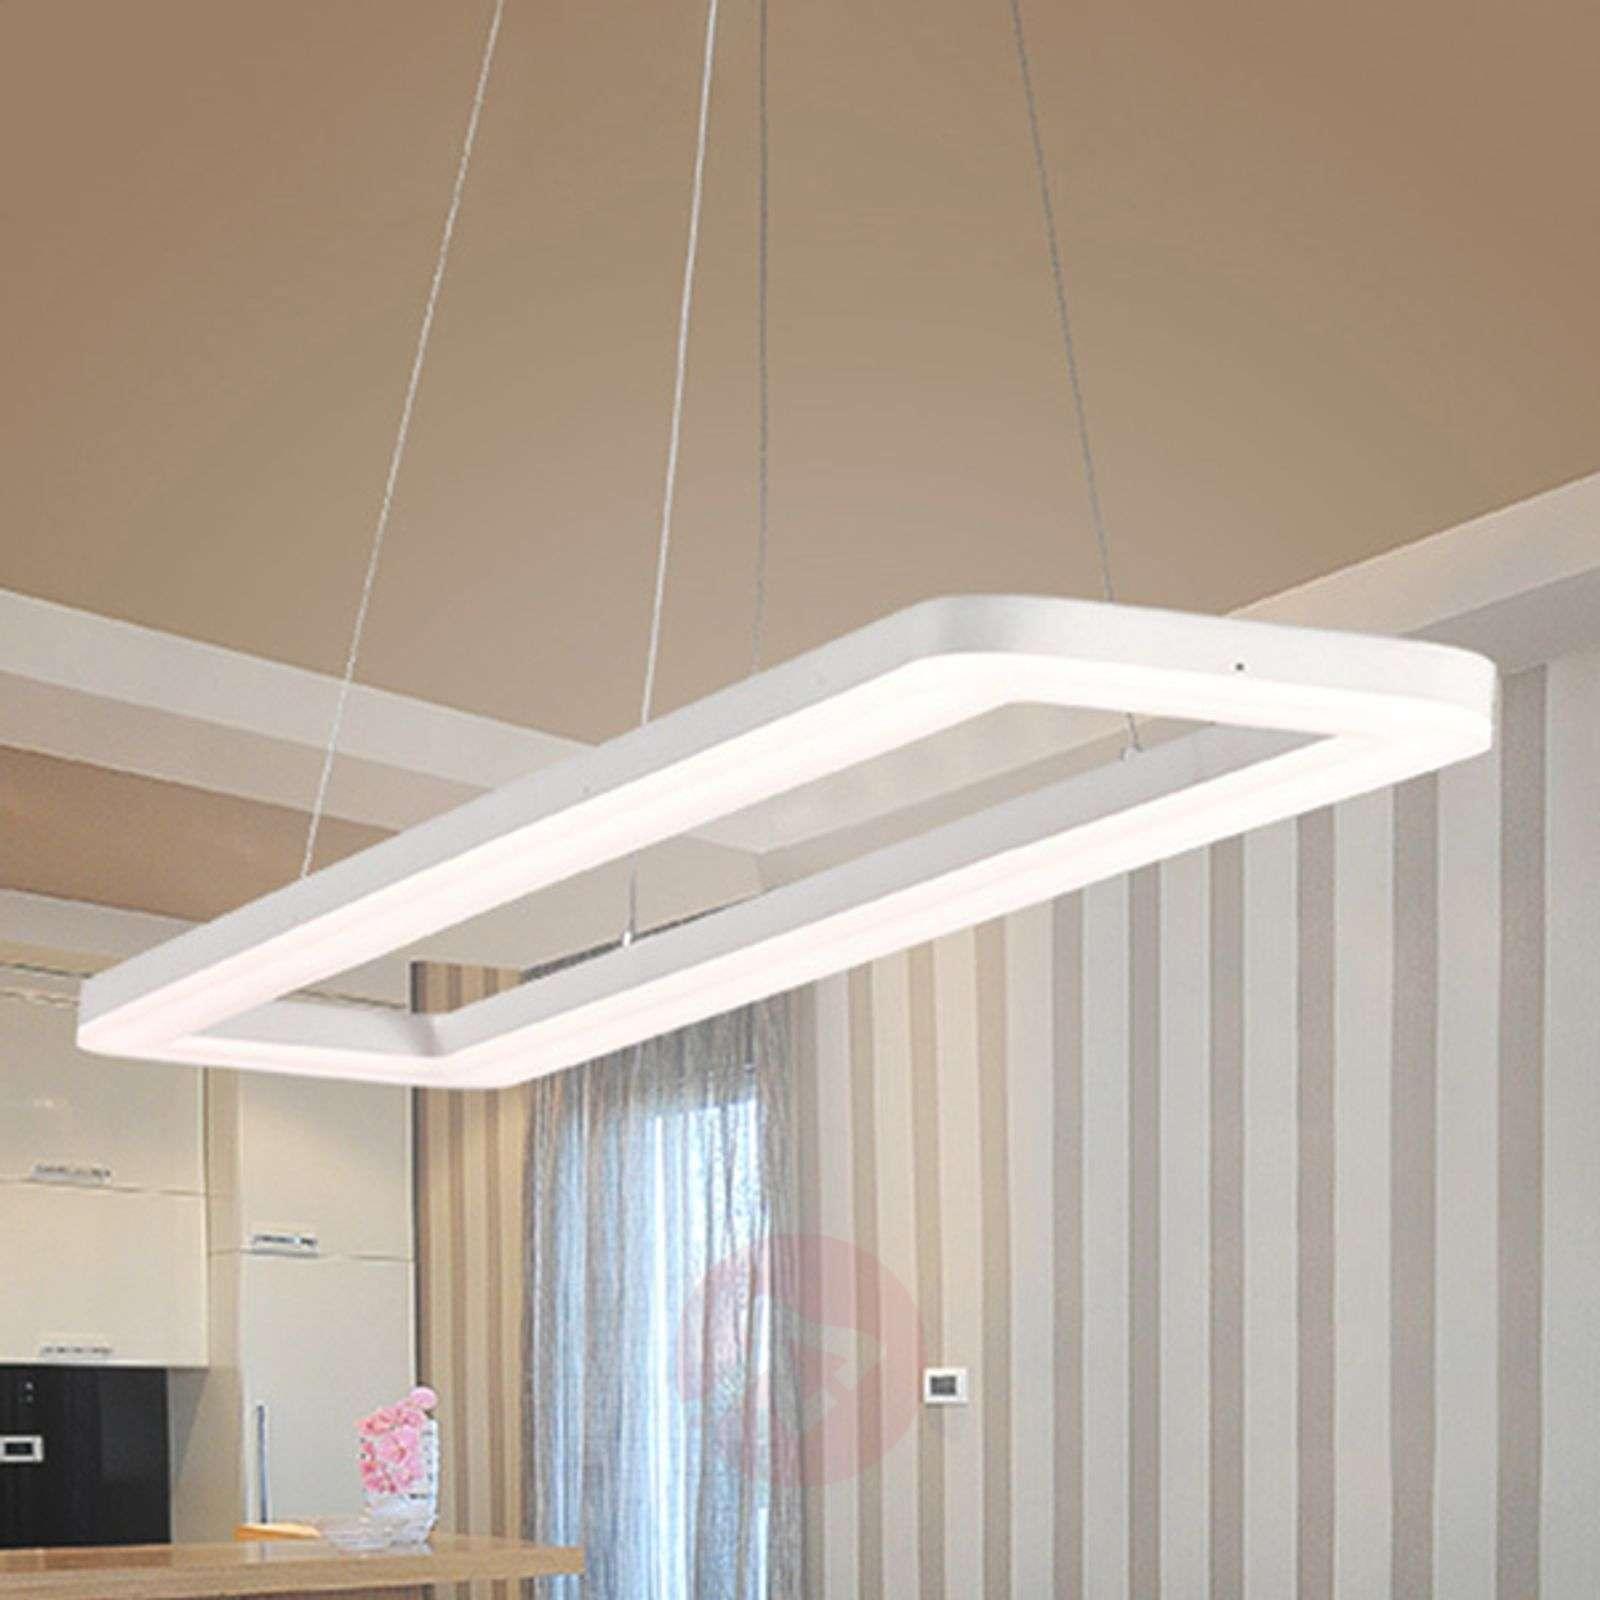 69 W bright LED hanging light Grete-1050104-01